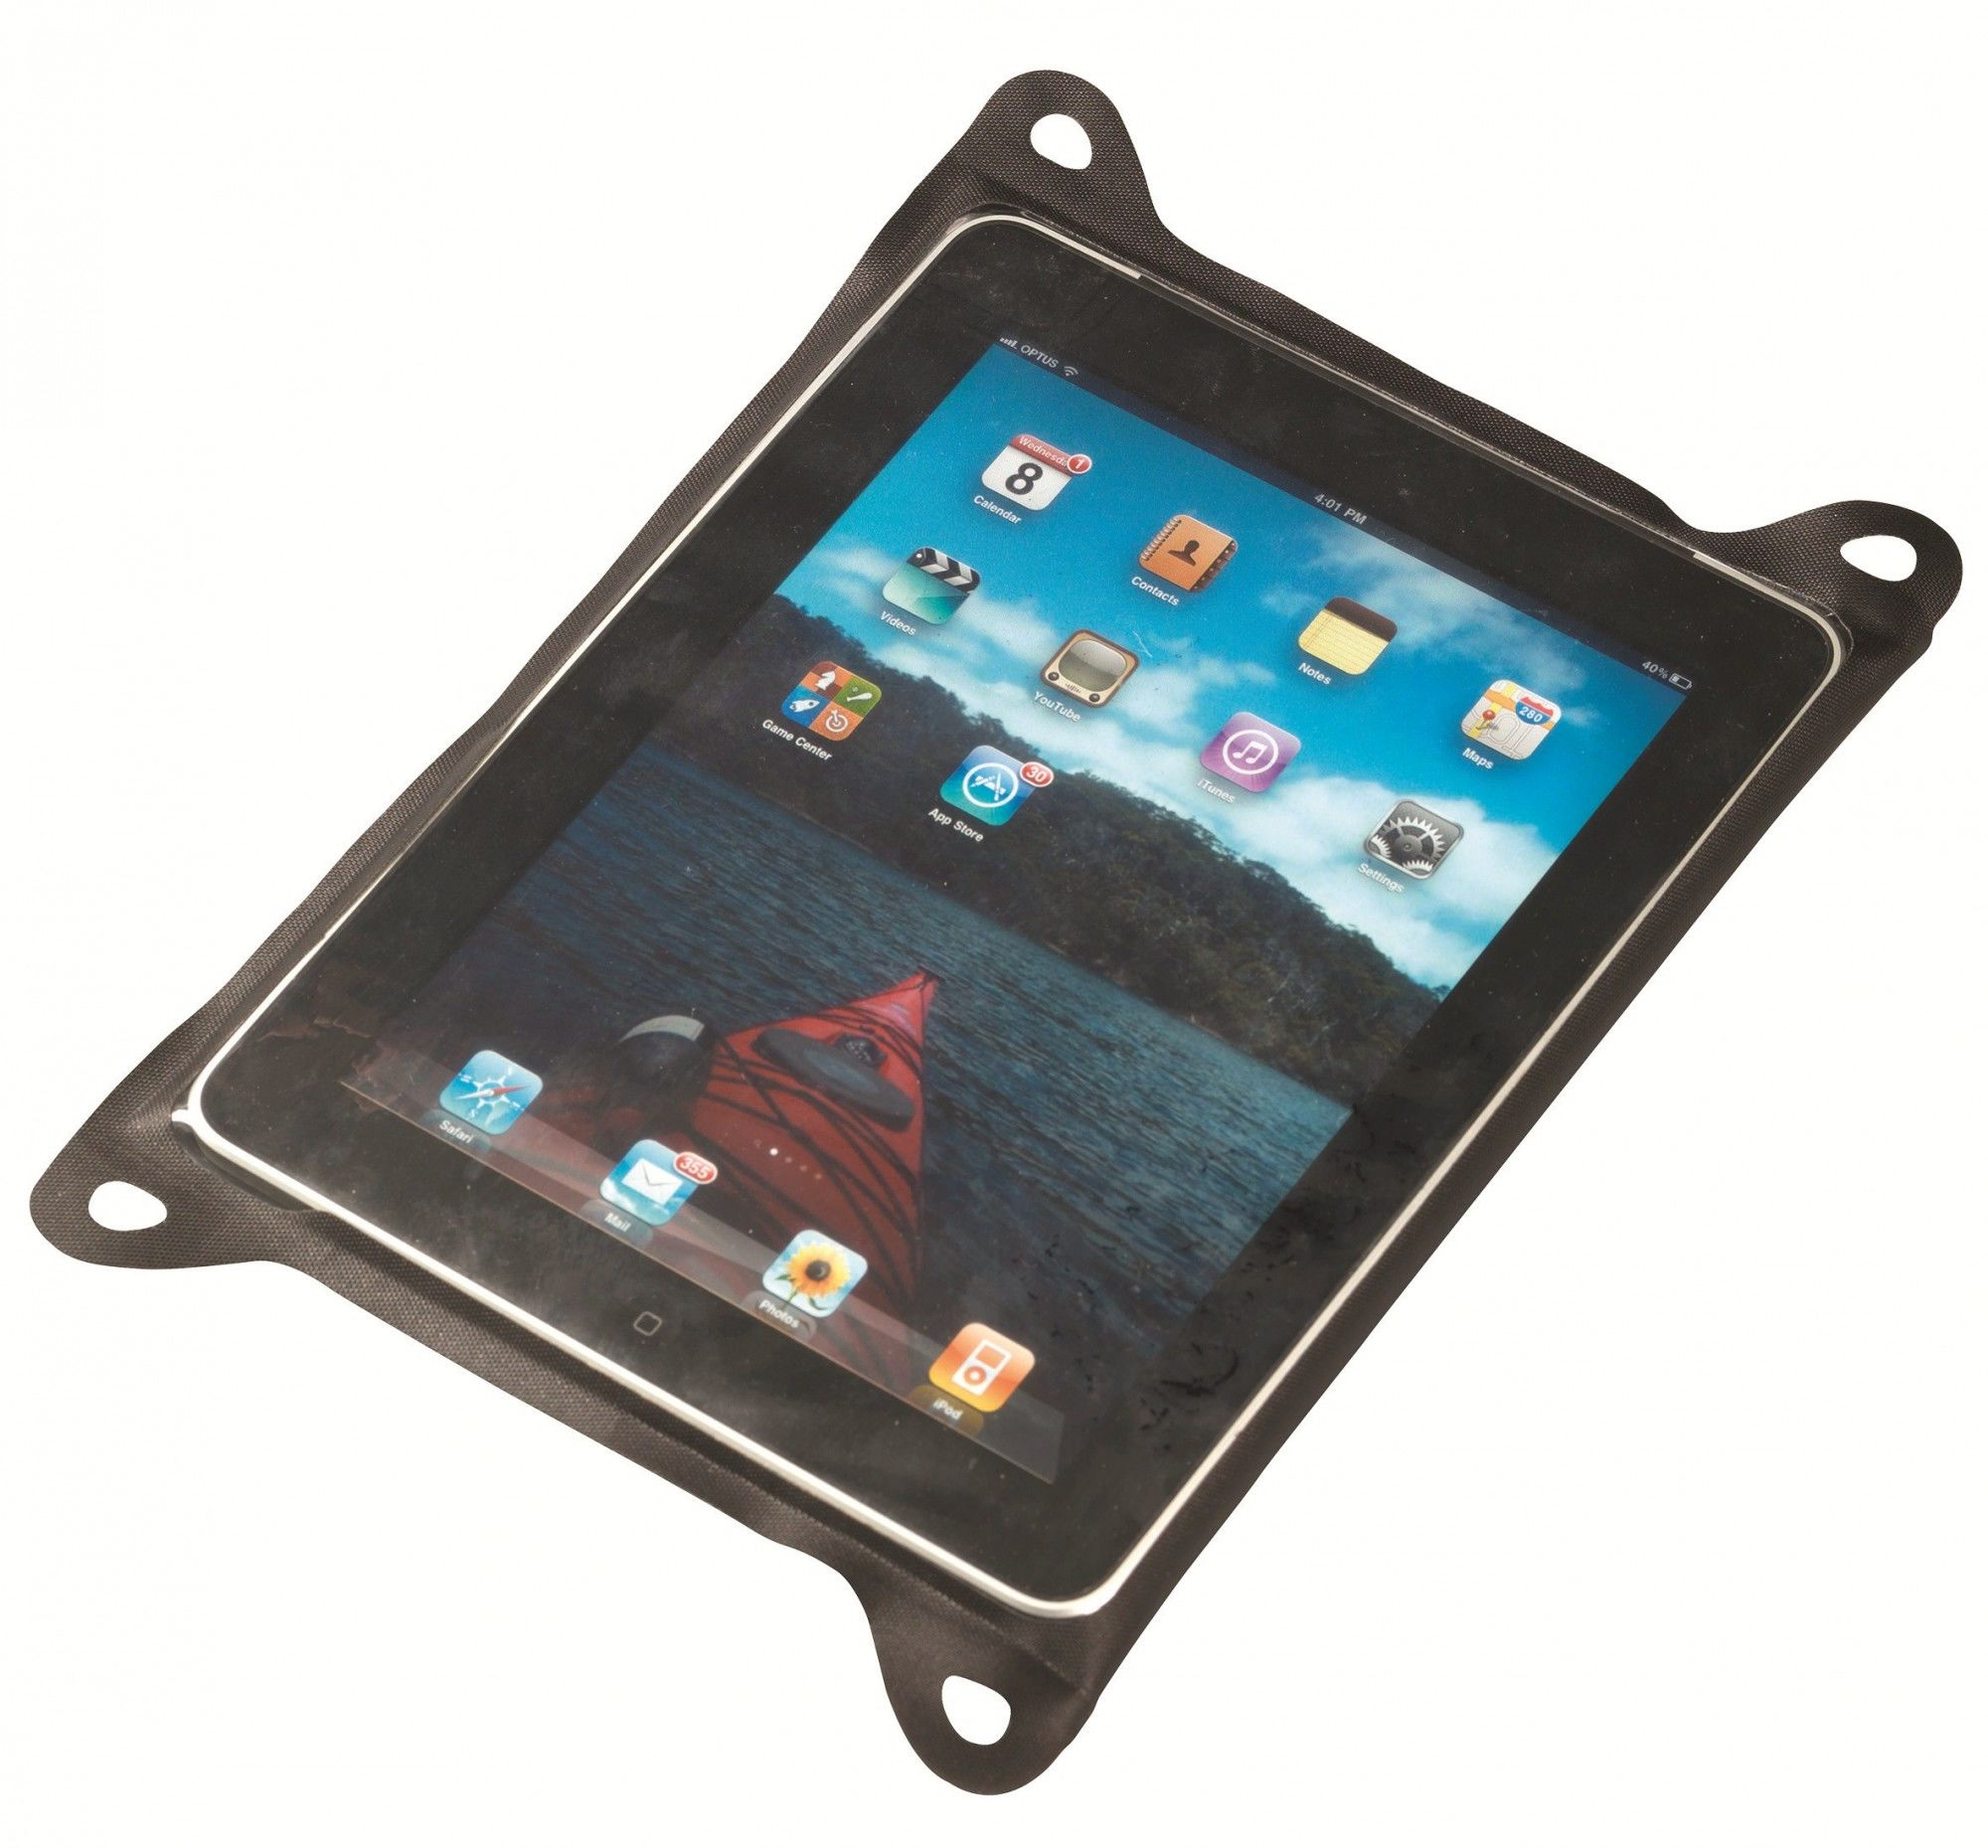 Sea to Summit TPU Case for Large Tablets Schwarz, Sonstige Taschen, One Size